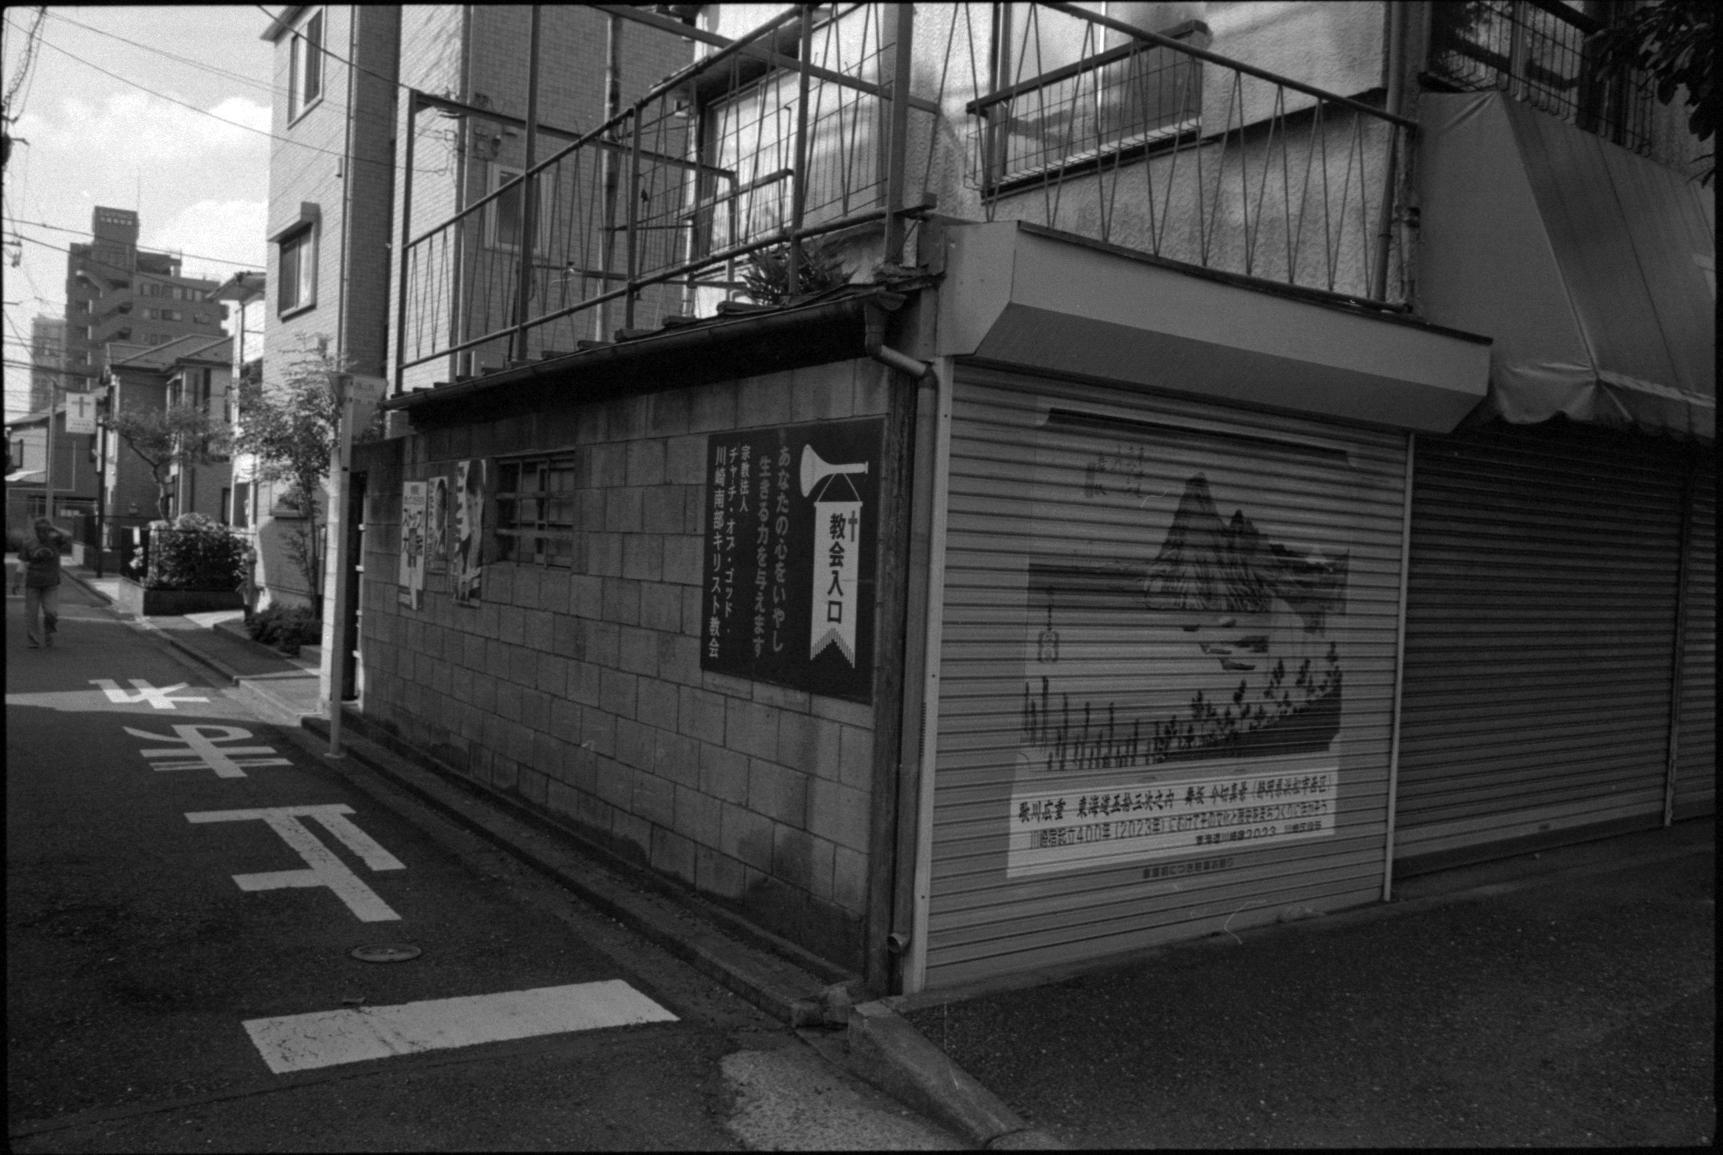 20140619 LeicaM4-P Elmarit28 400TX TMD 025